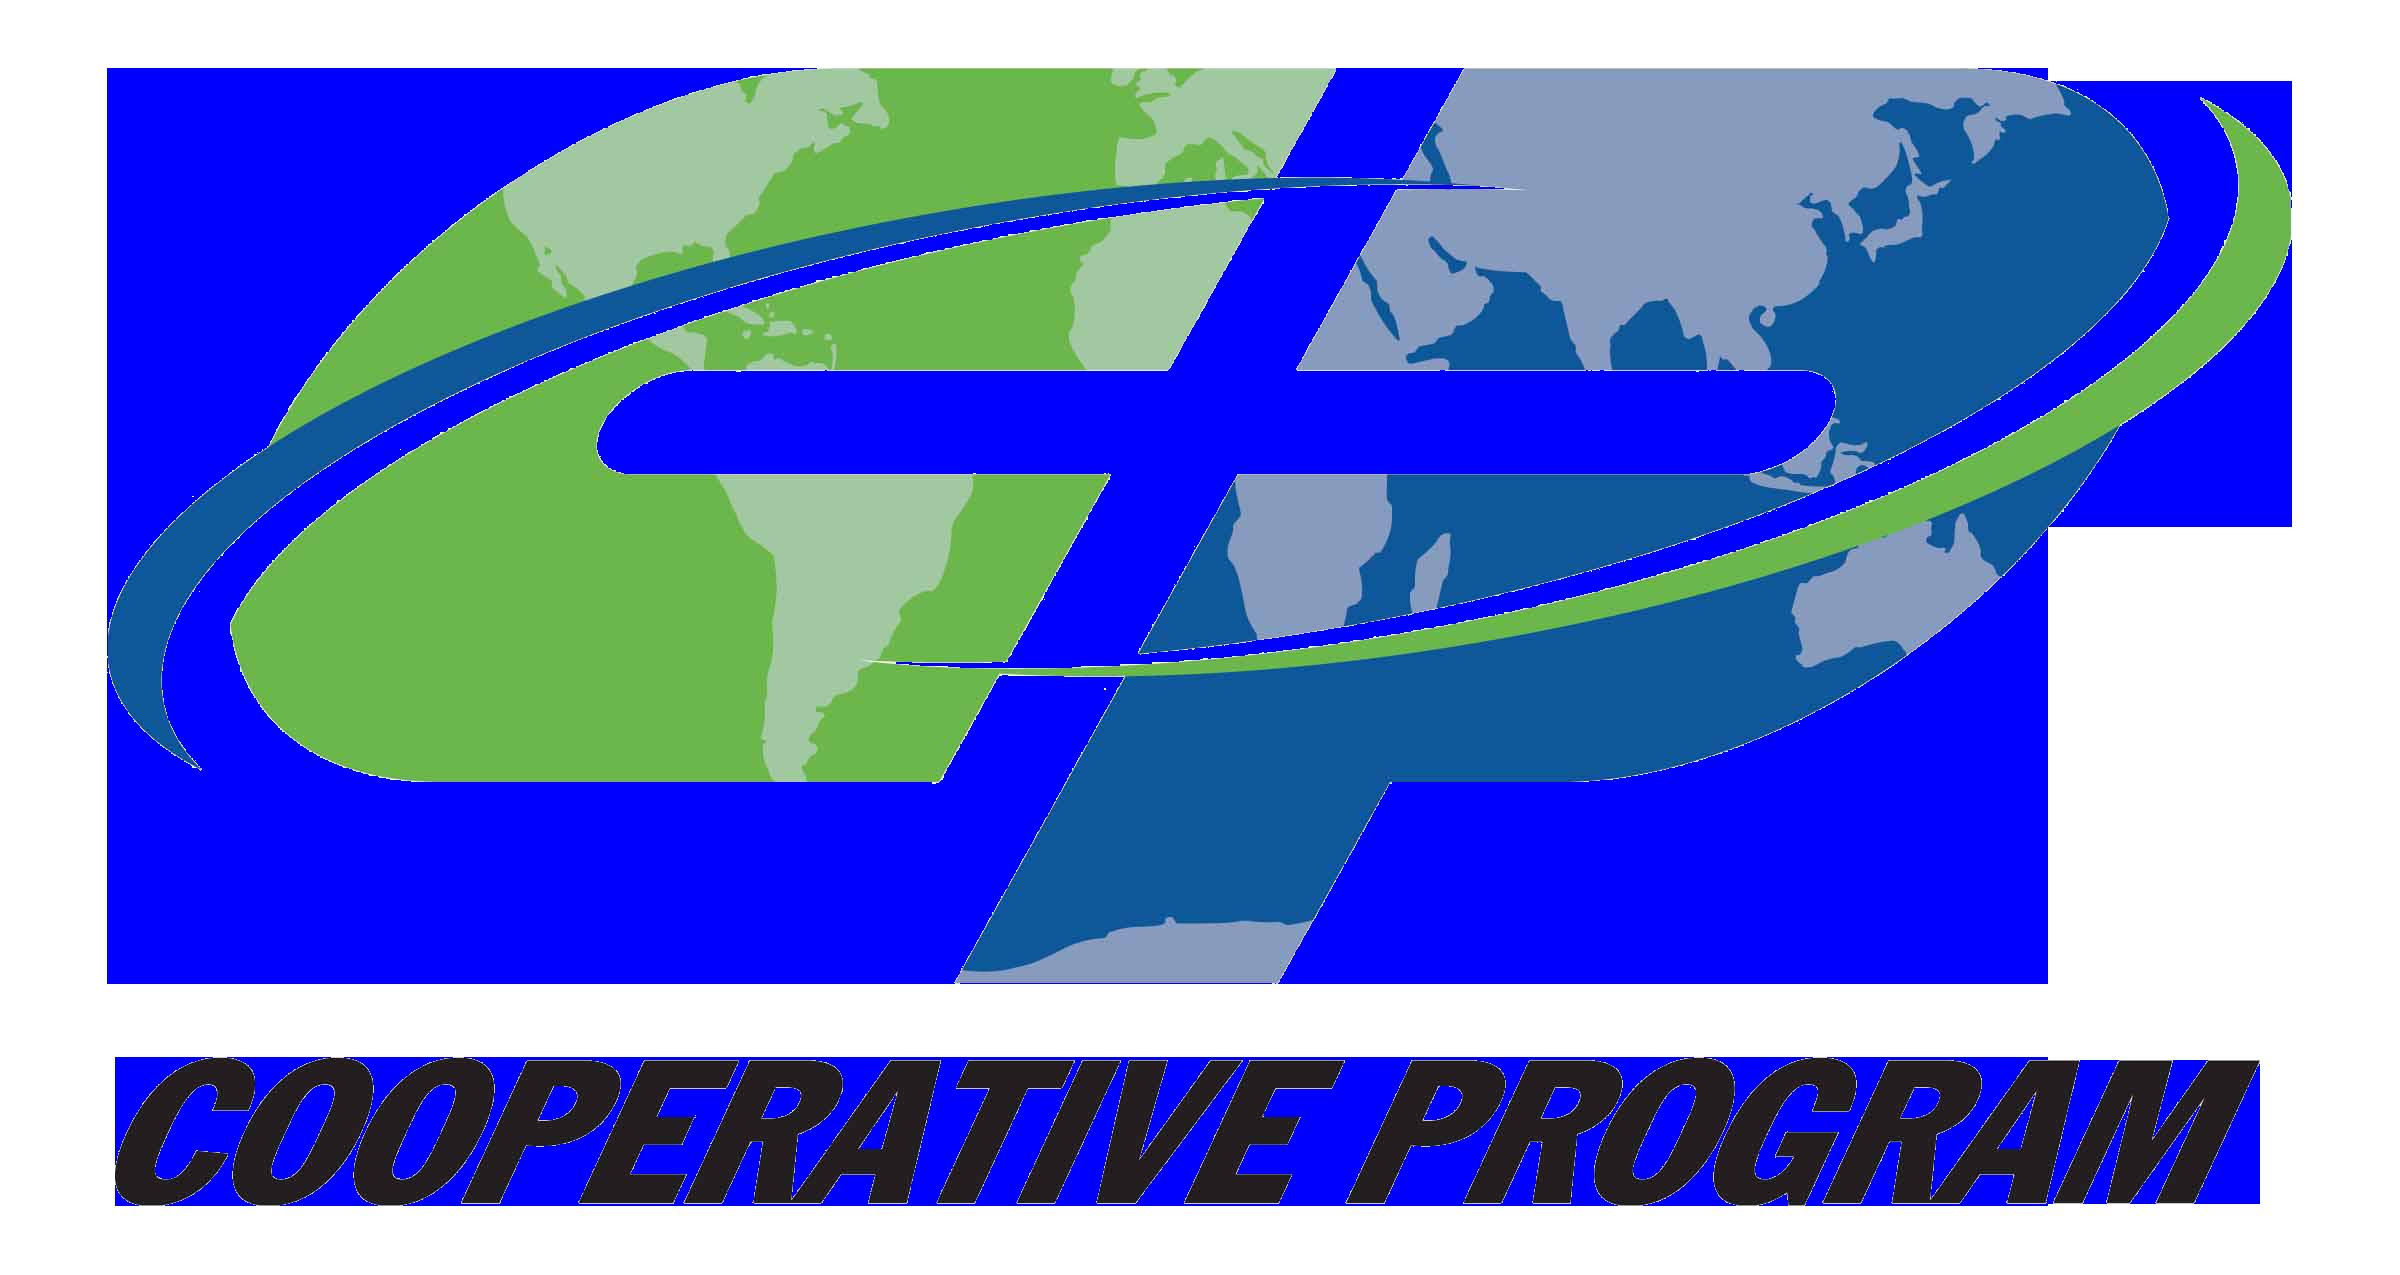 Cooperative-Program.png